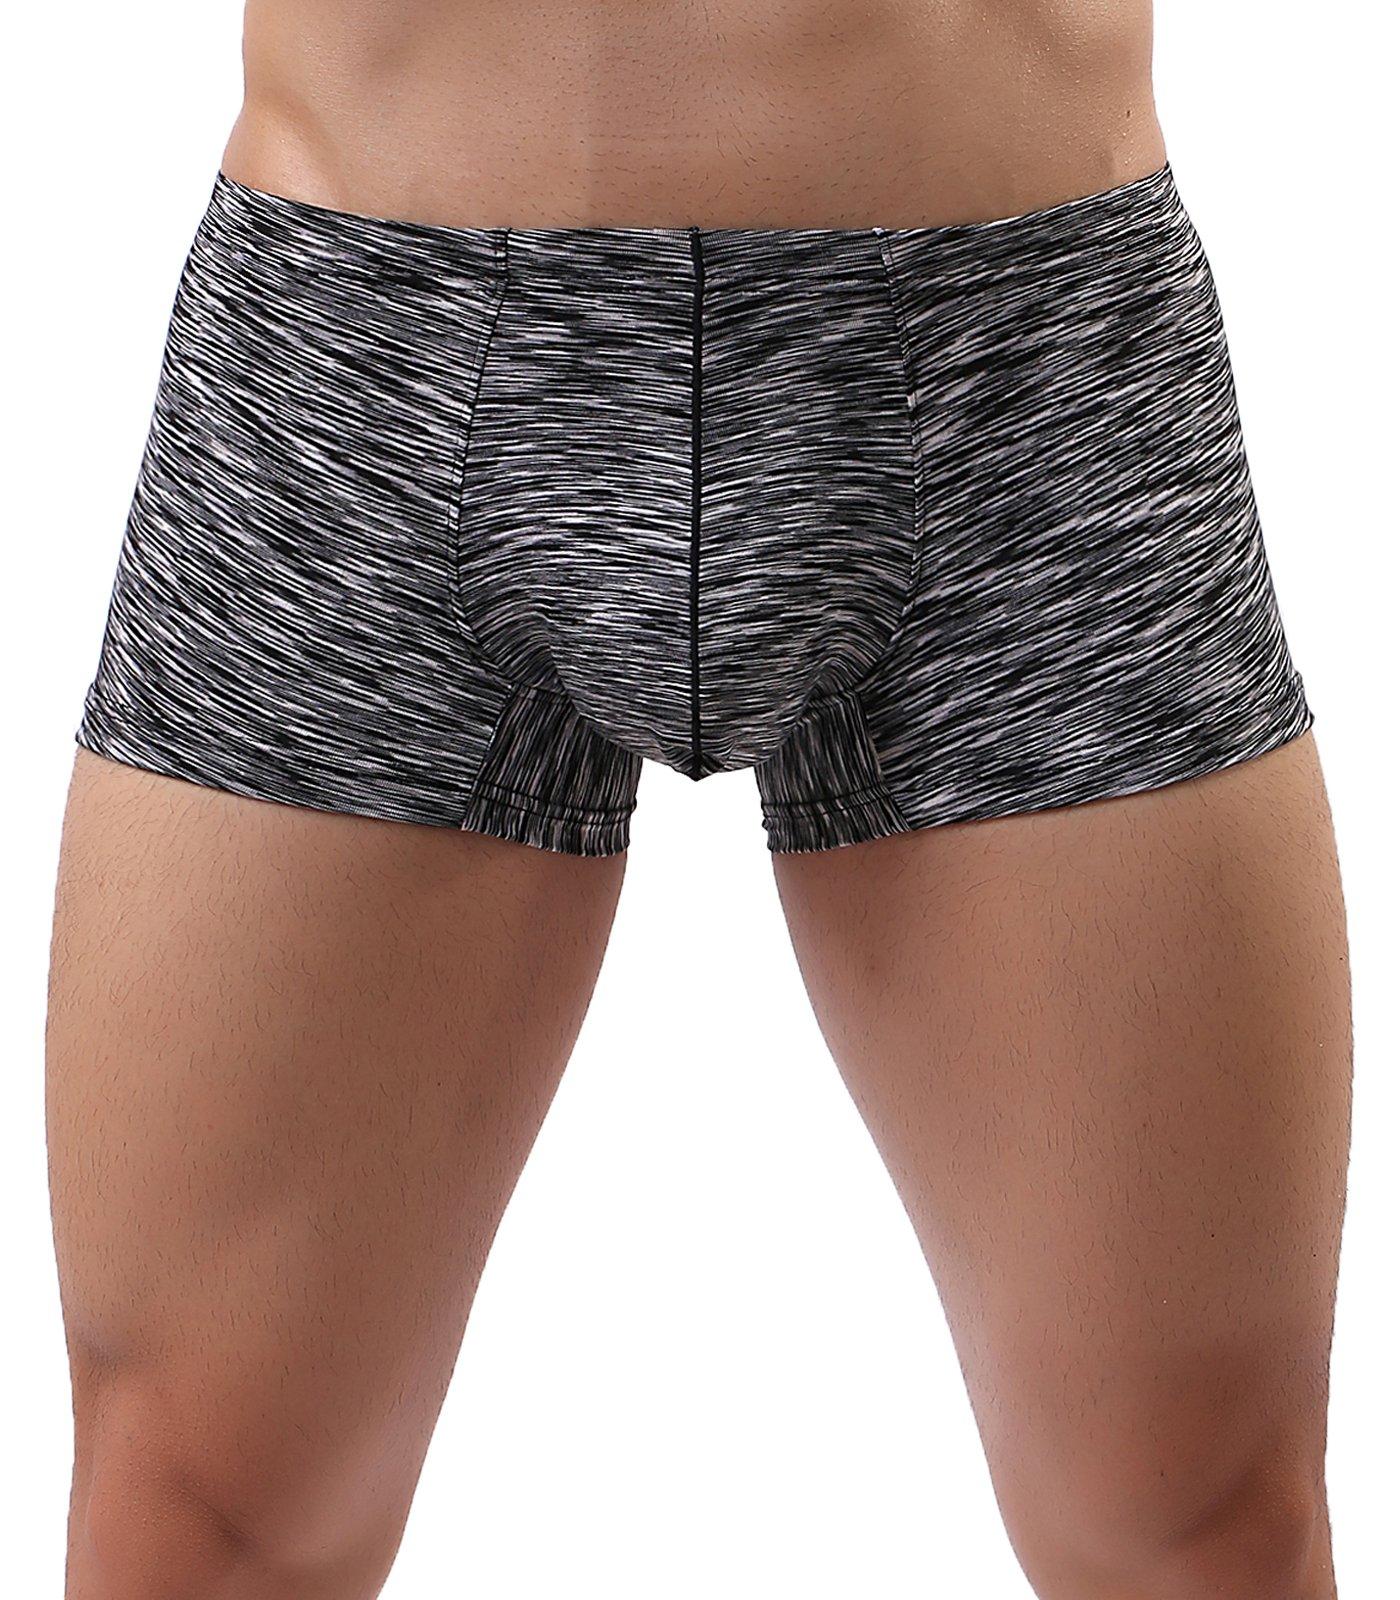 MAKEIIT Young Underwear X-Temp Boxers Guys Underwear Fitted Cool Boxer Briefs Men by MAKEIIT (Image #3)